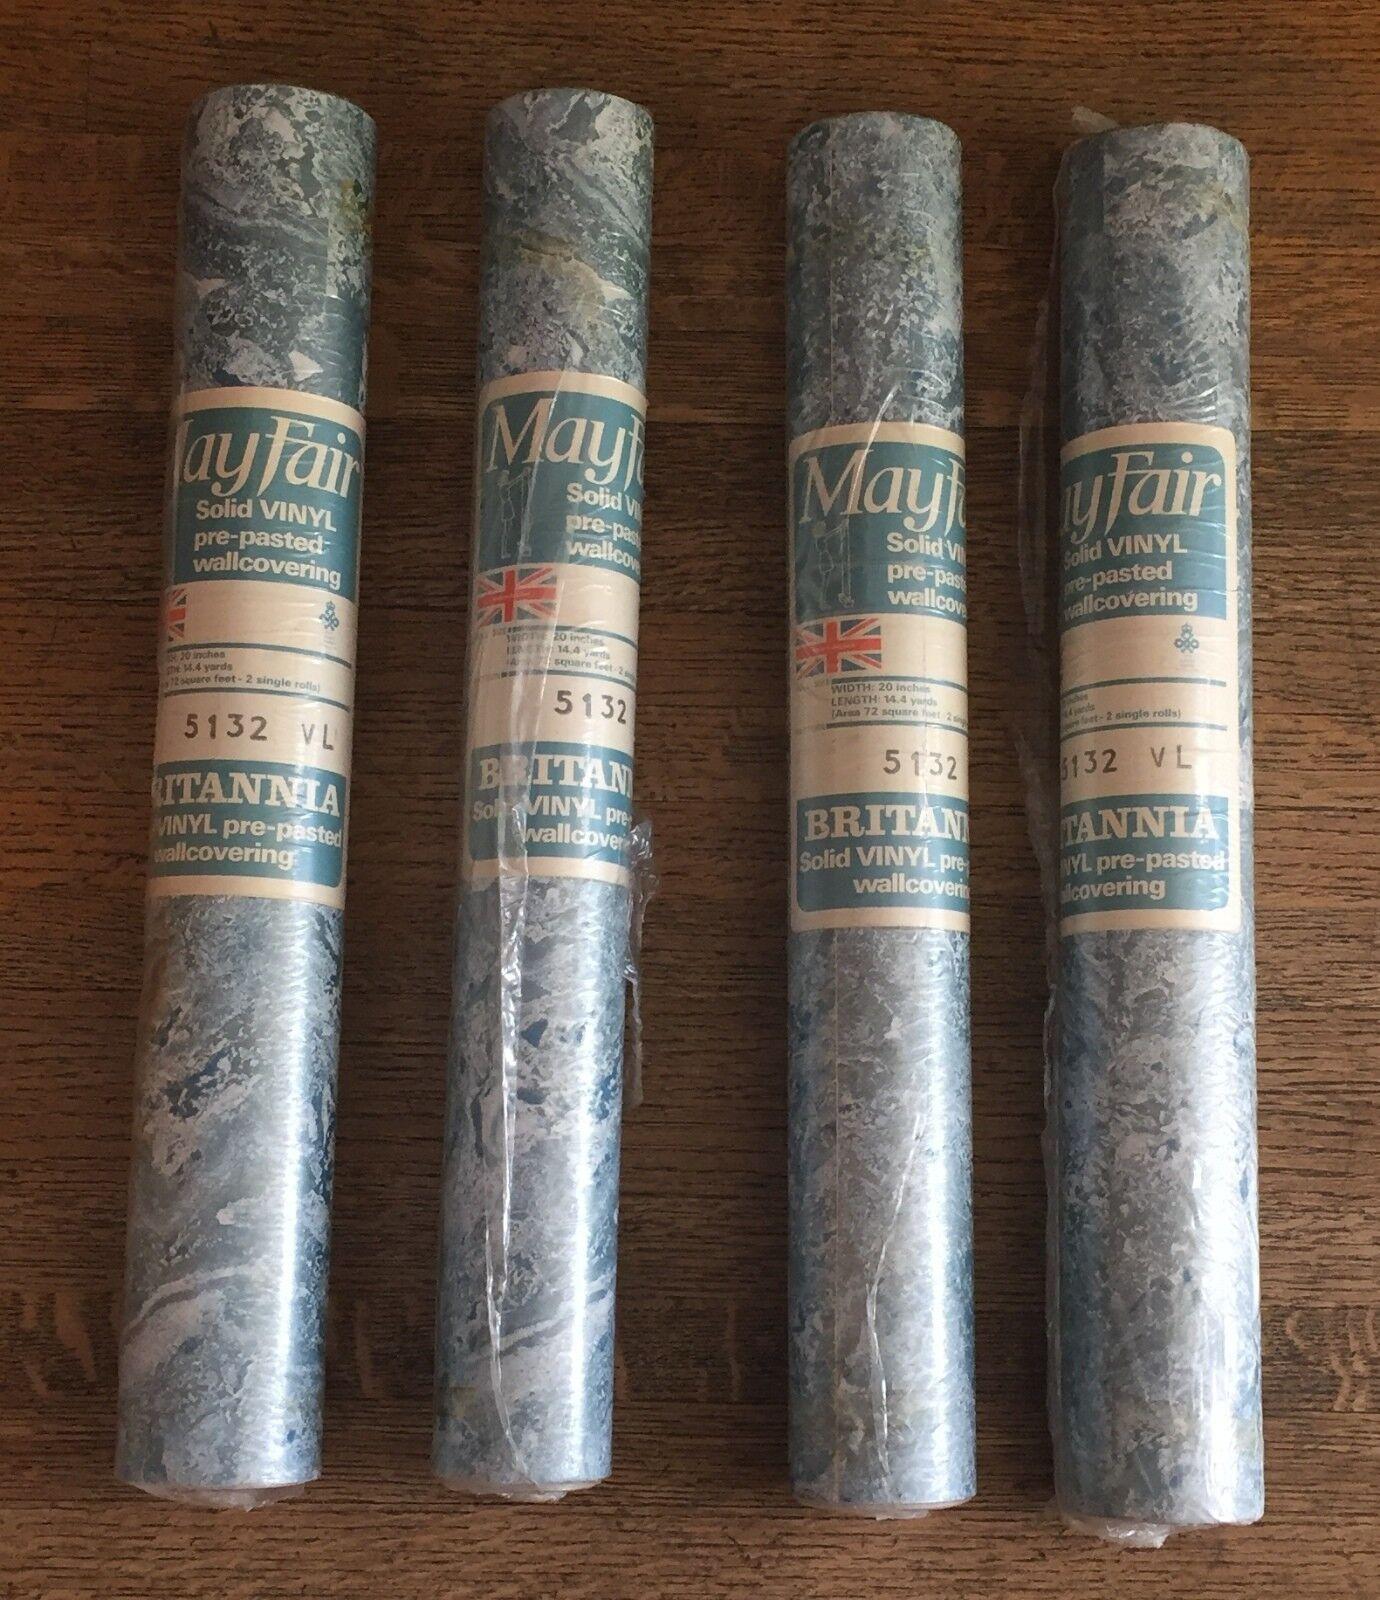 4 Matched Rolls MAYFAIR  Blau Wallpaper VINYL RETRO VINTAGE 1970s, Never Opened